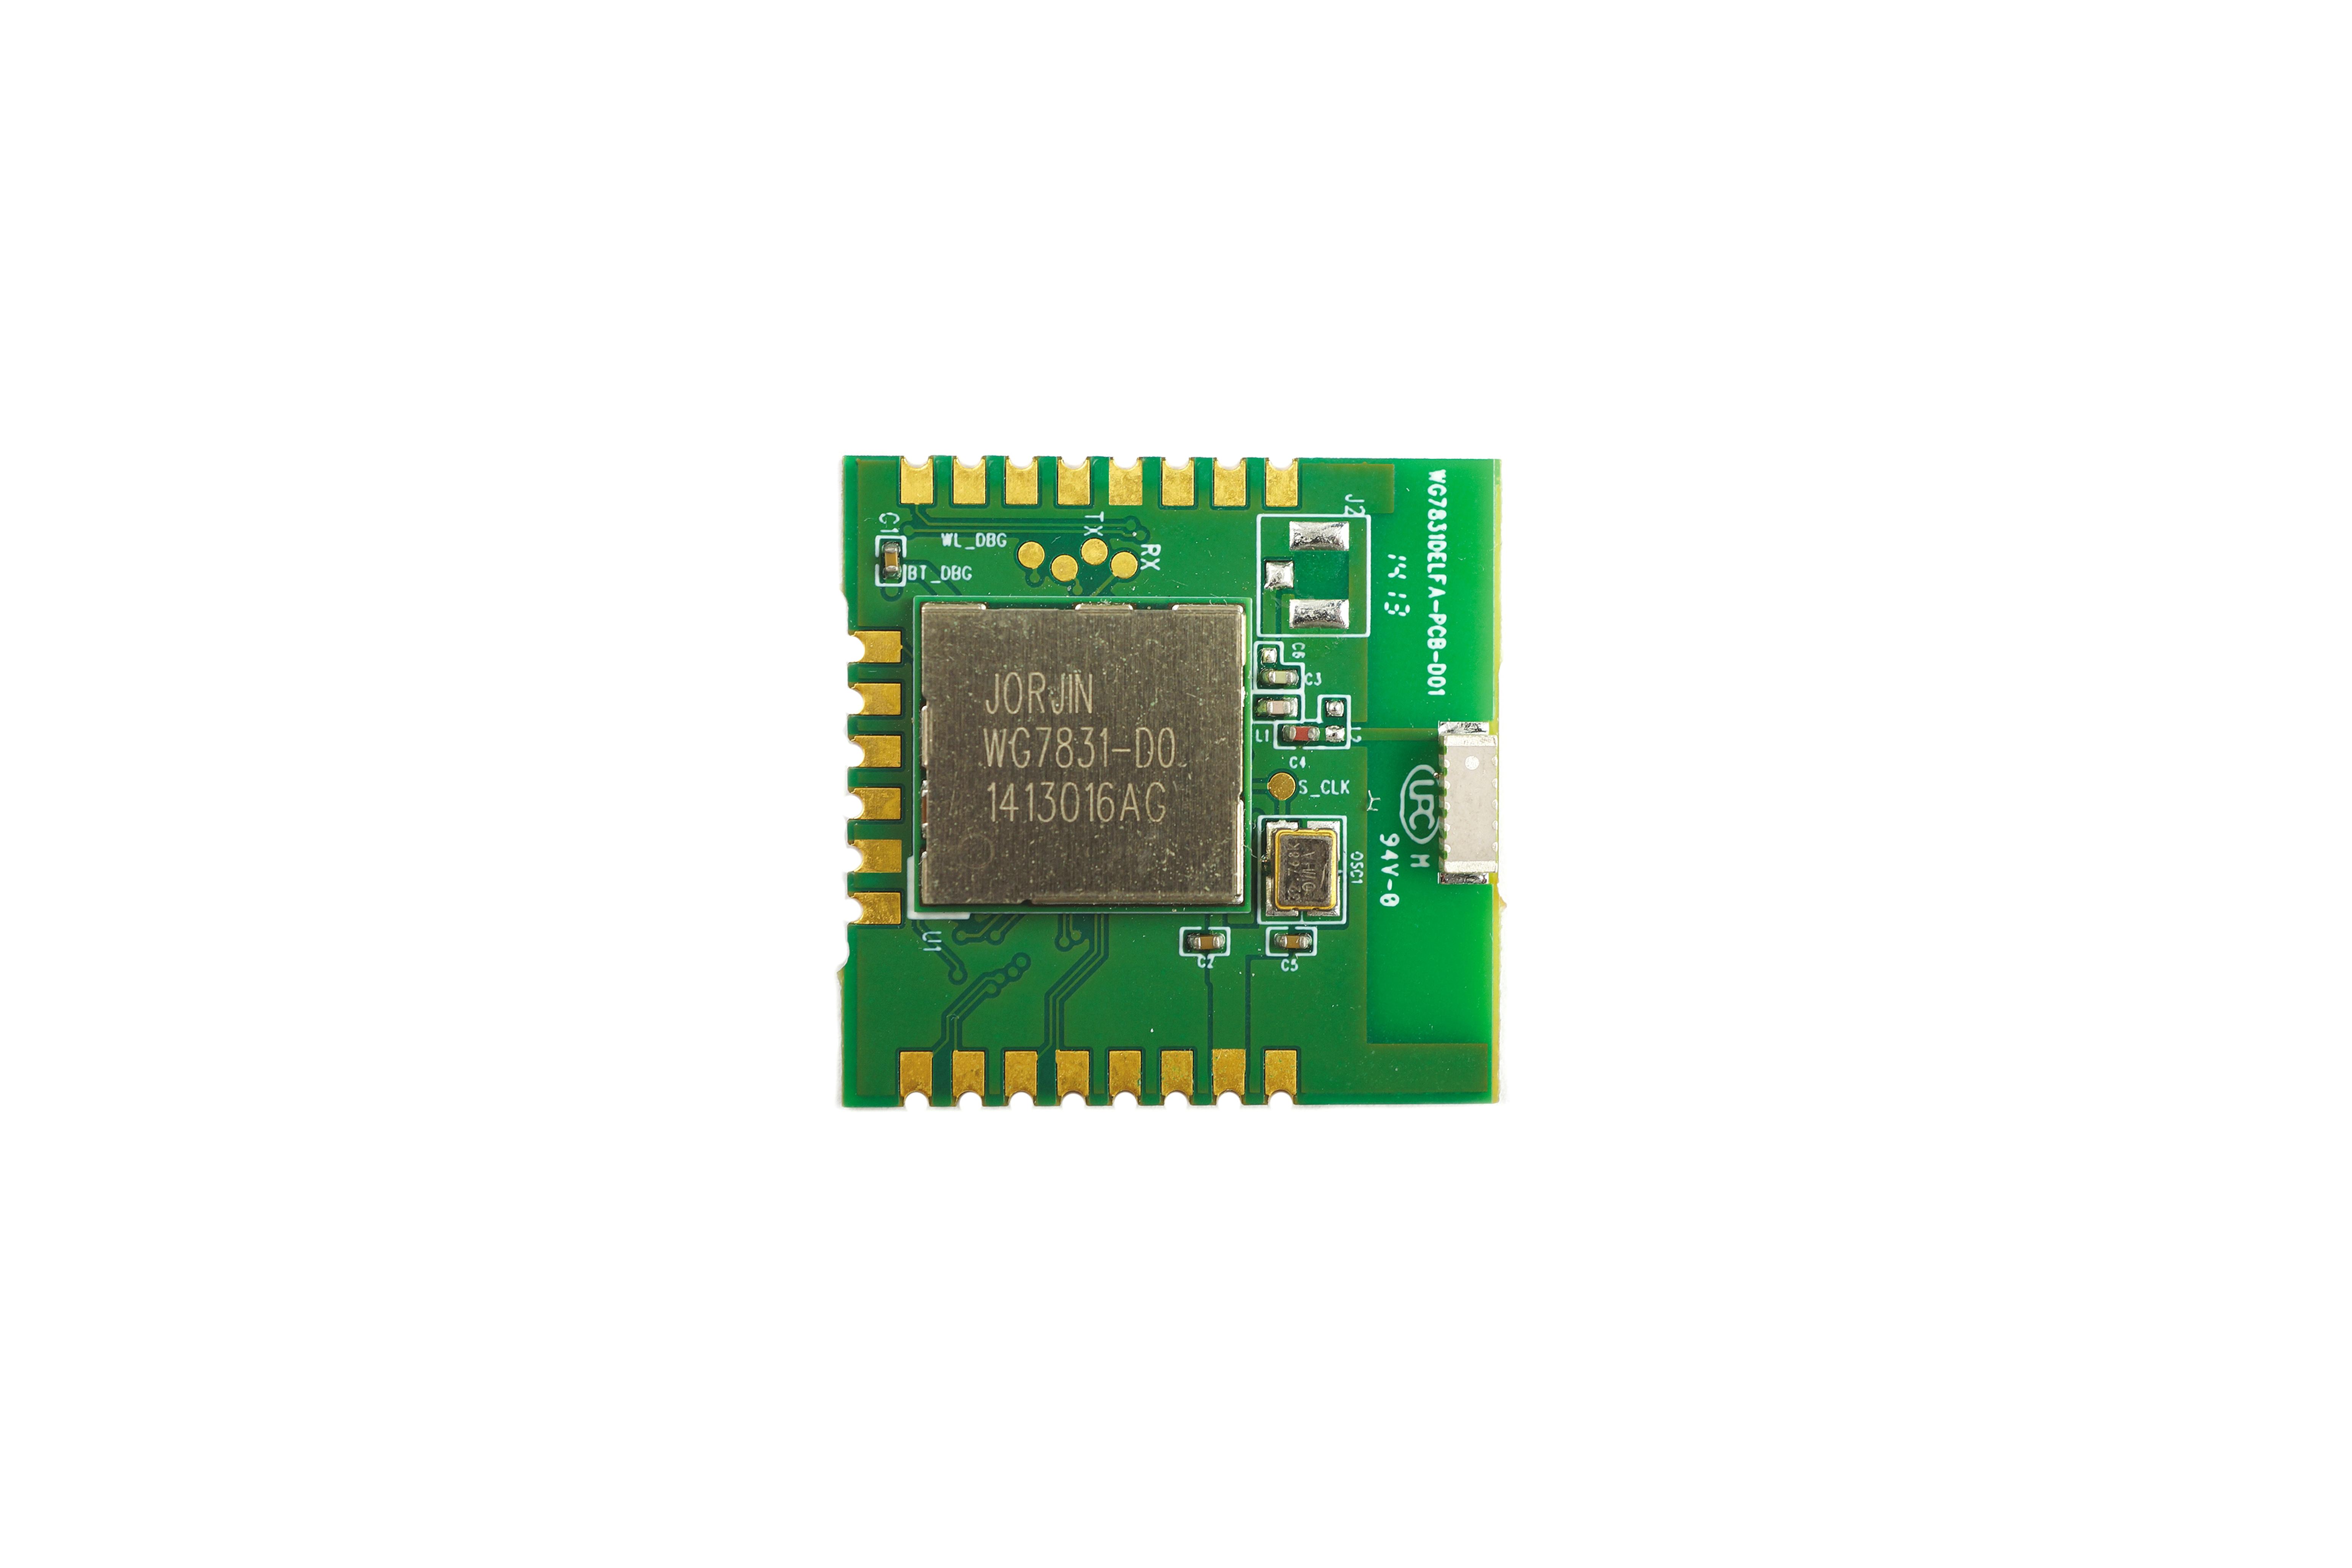 WG7831-DELFA WLAN-module, 802.11b/g/n